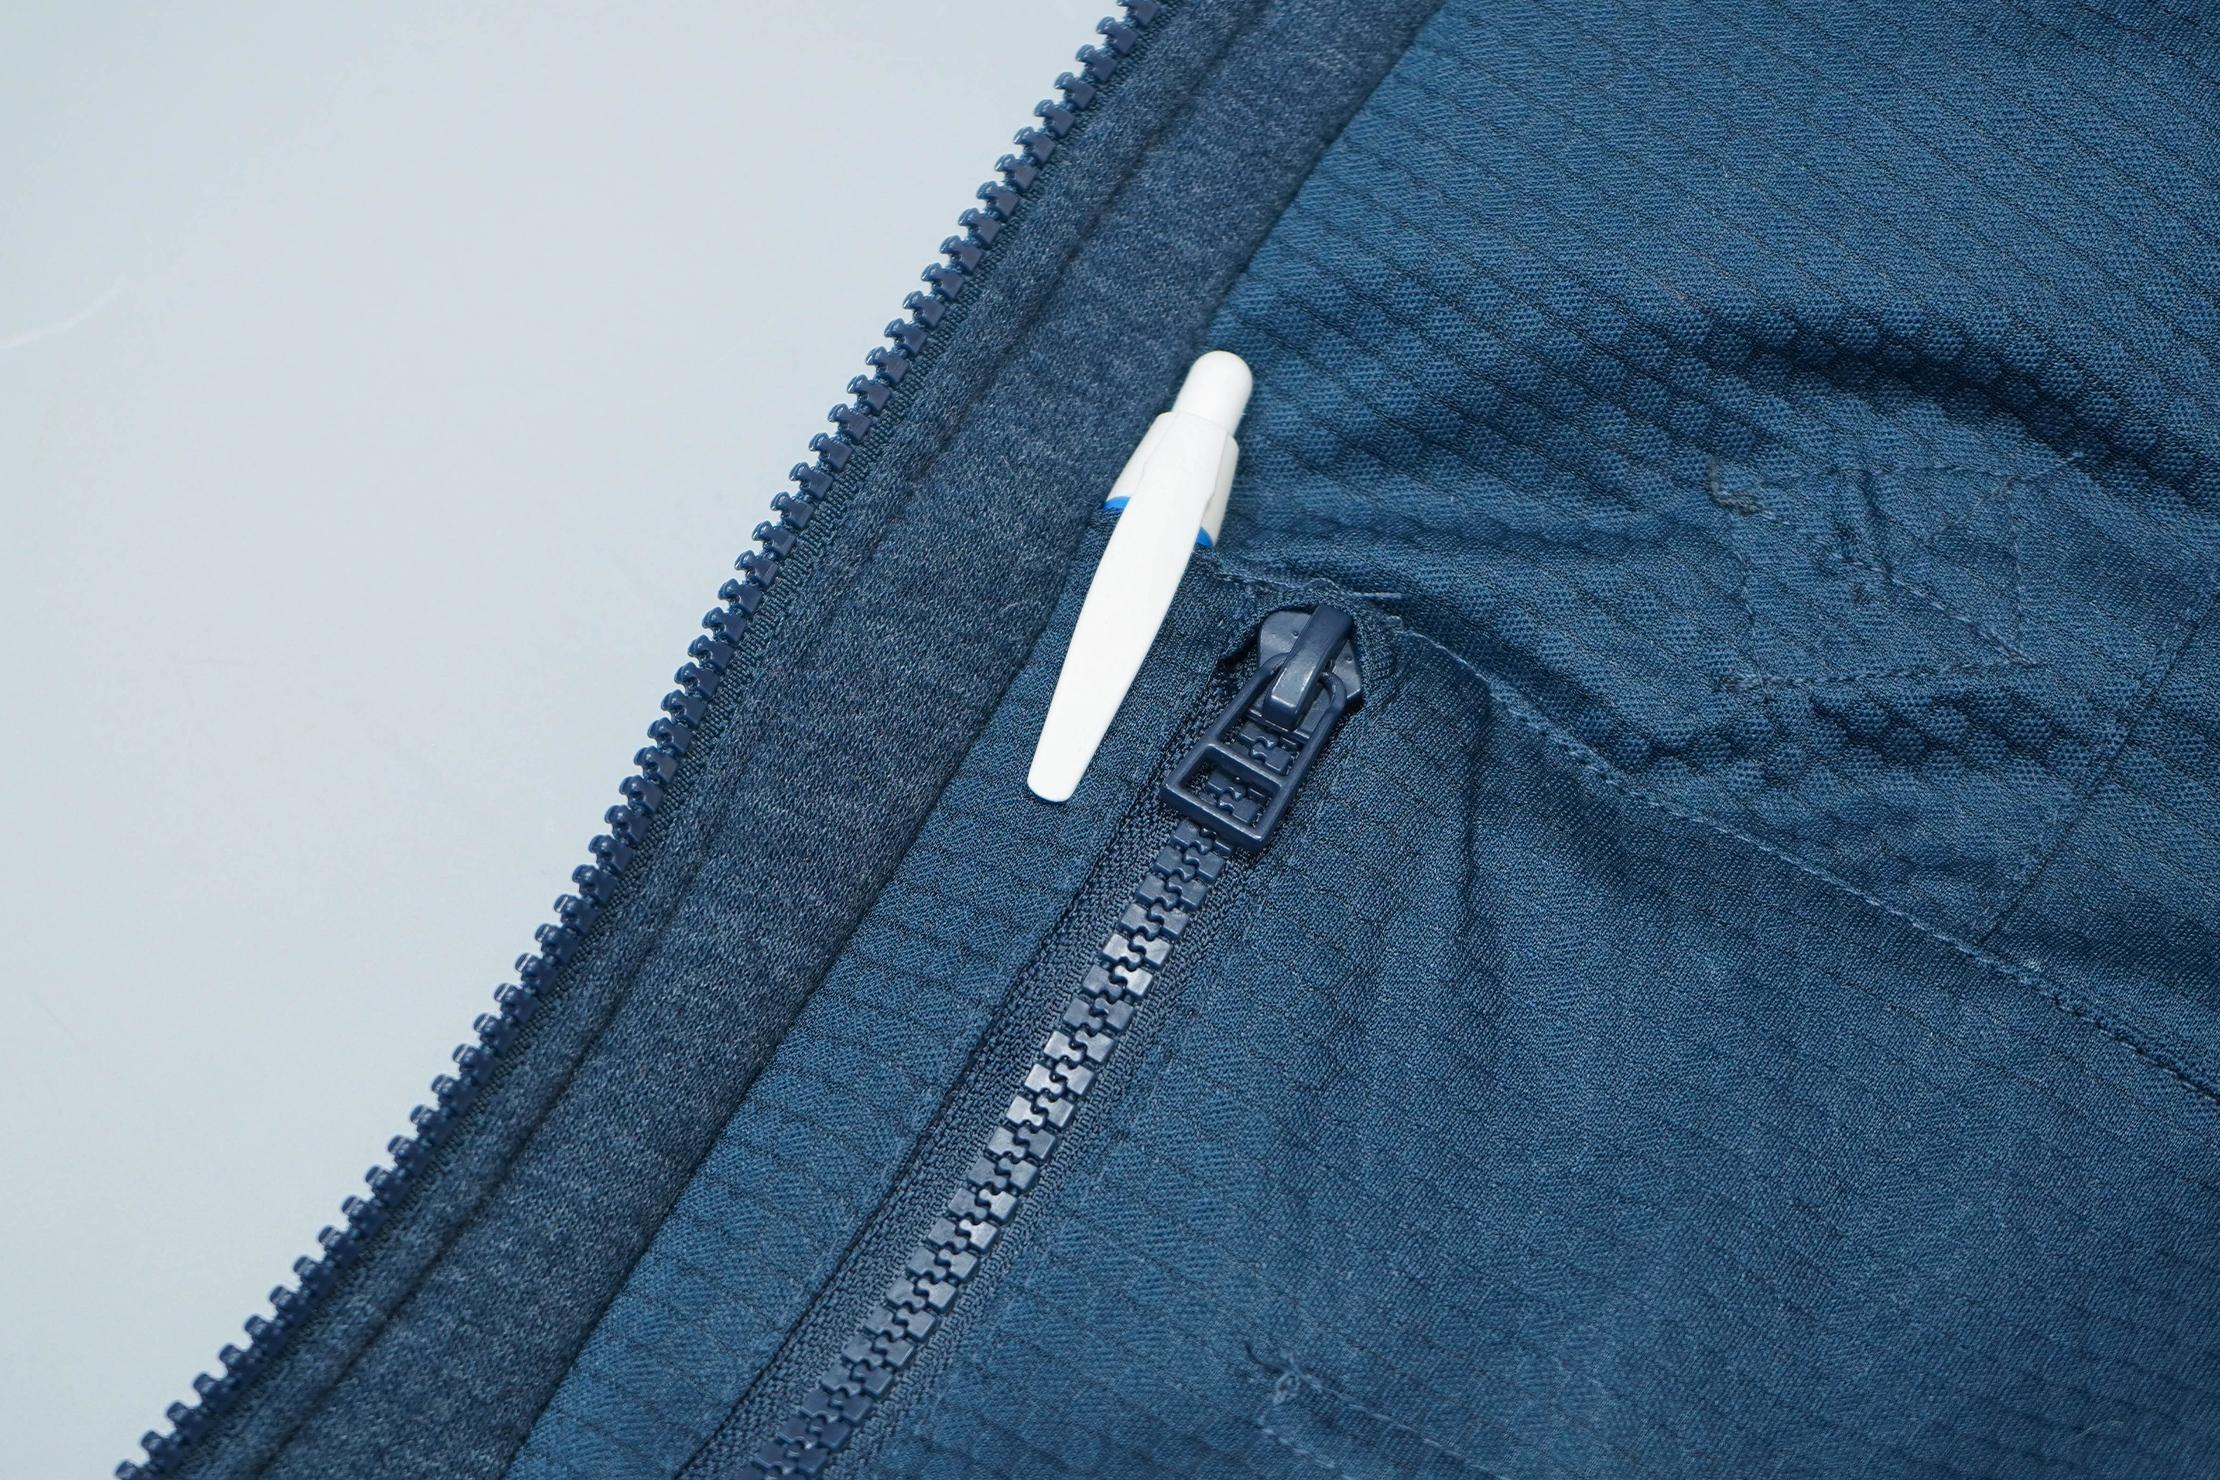 BauBax Sweatshirt 2.0 Pen Pocket